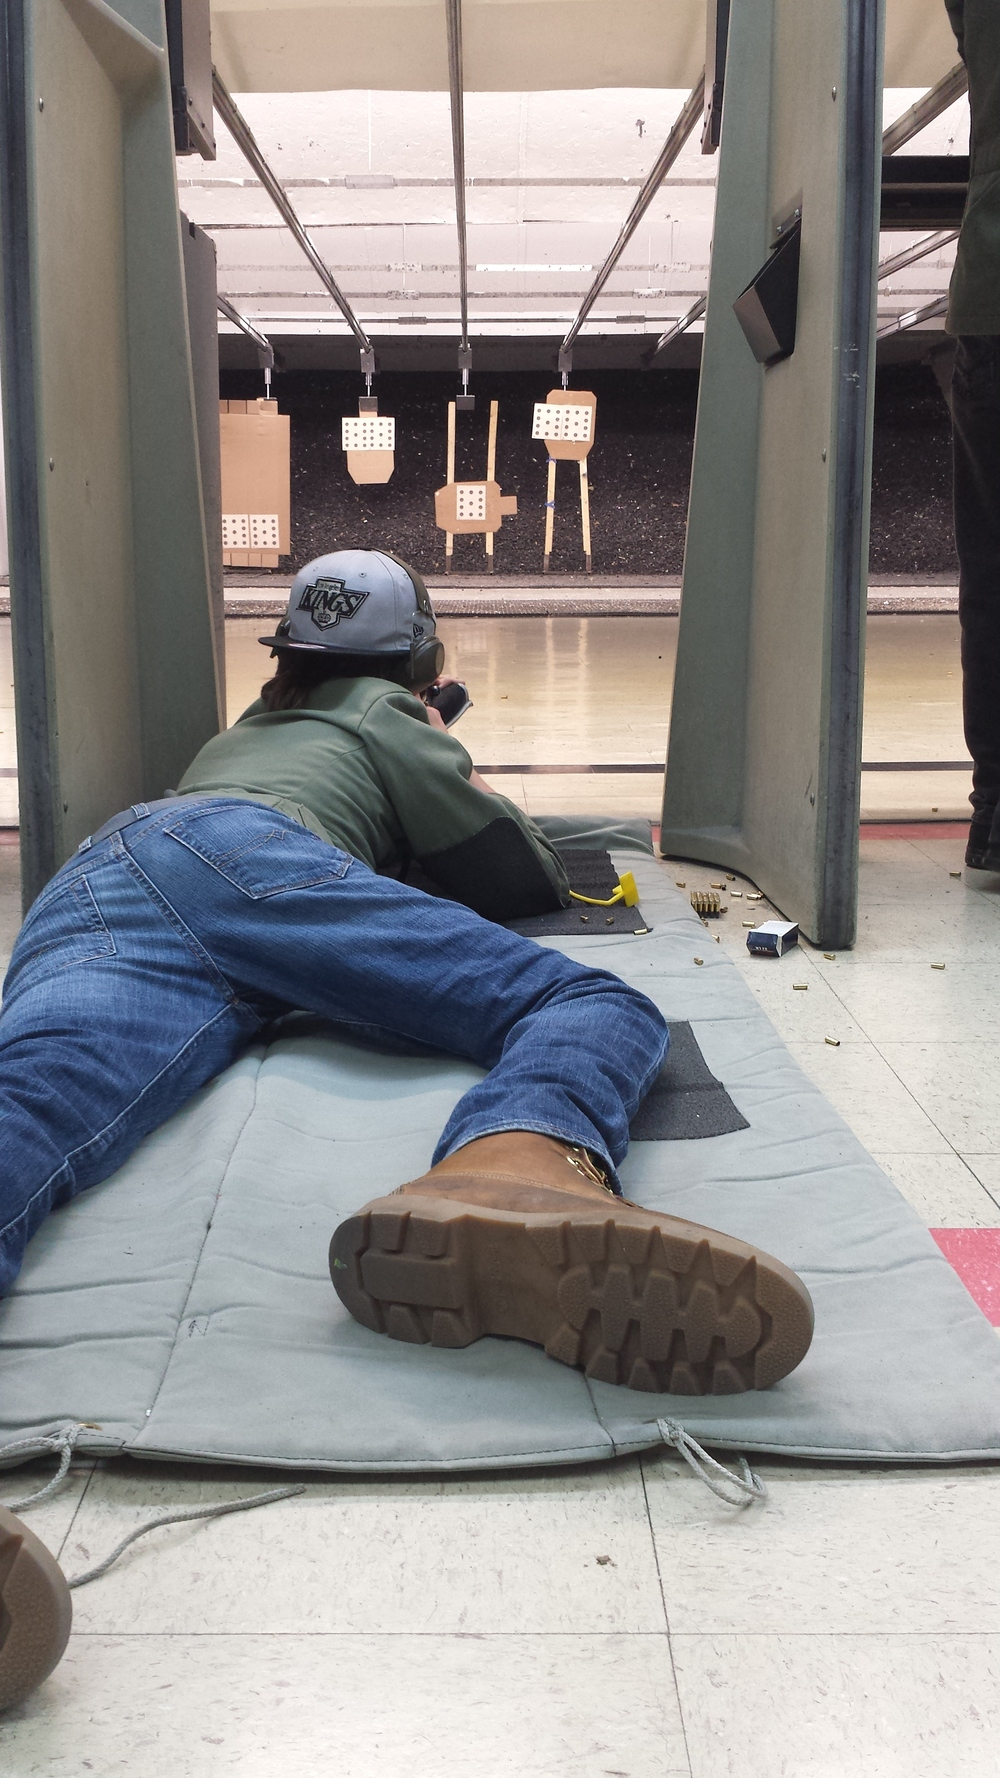 Ethan shooting prone